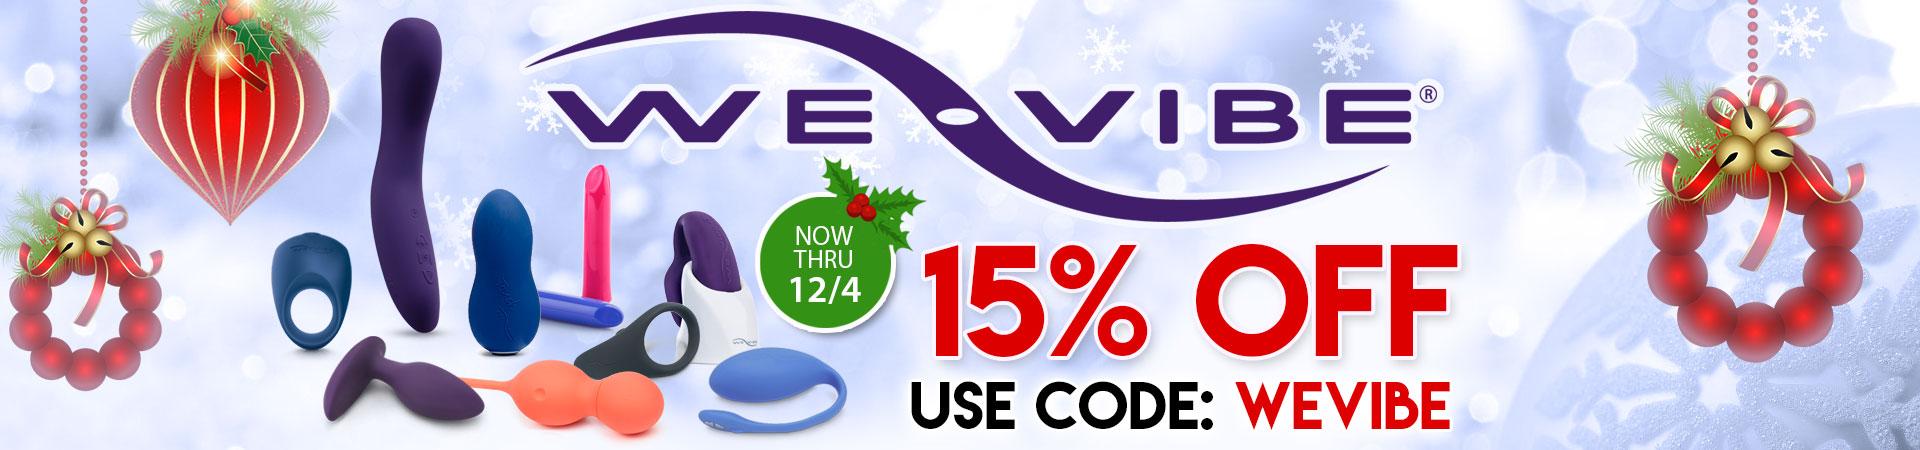 15% OFF We-Vibe - Use Code: WEVIBE - Now Thru 12/4